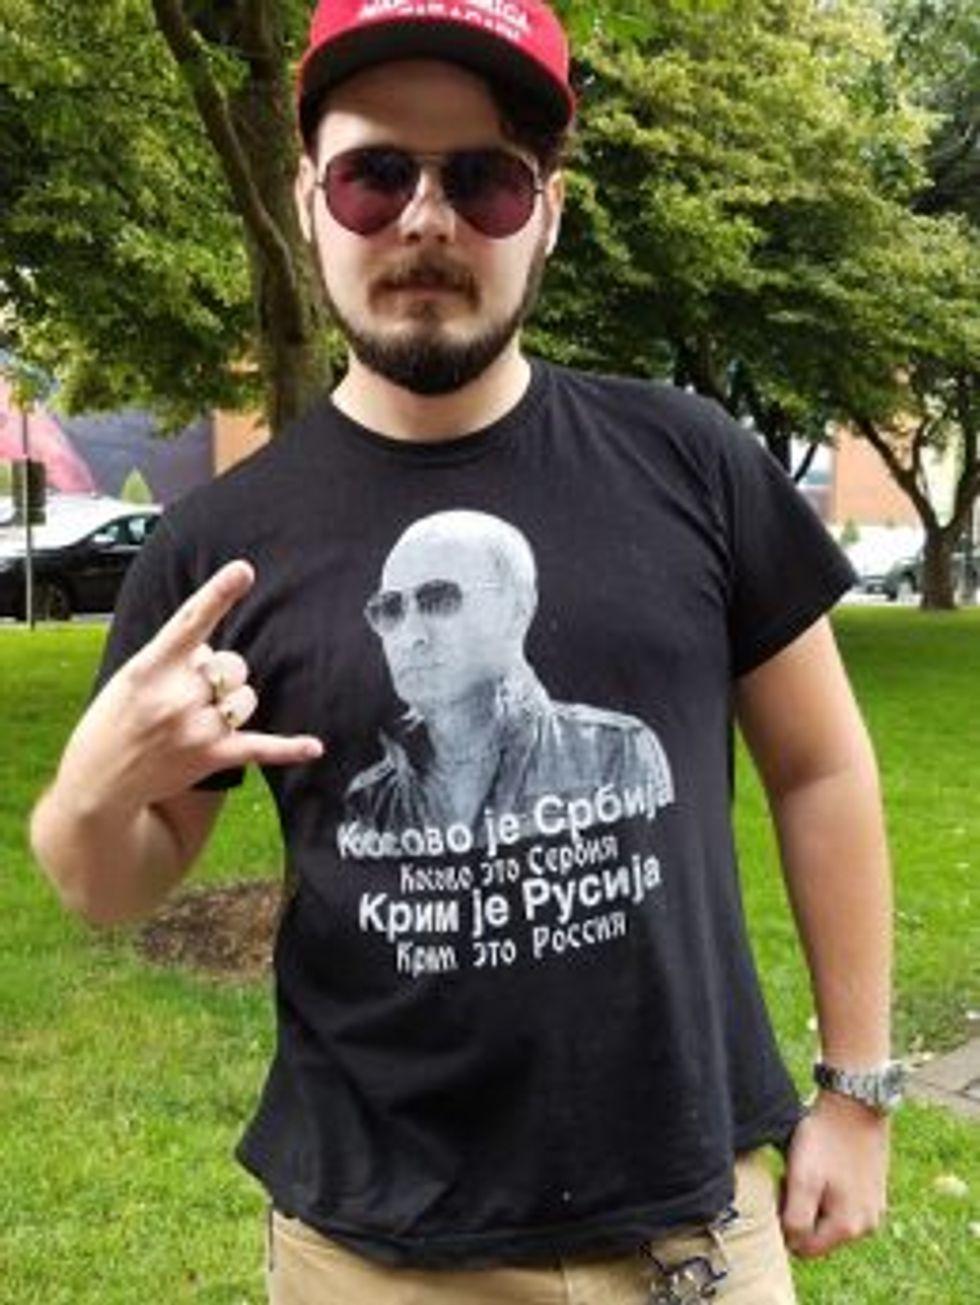 This is Timmy Matlock,. The shirt says: Kosovo is Serbian / Crimea is Russian (Image Credit: Arun Gupta)